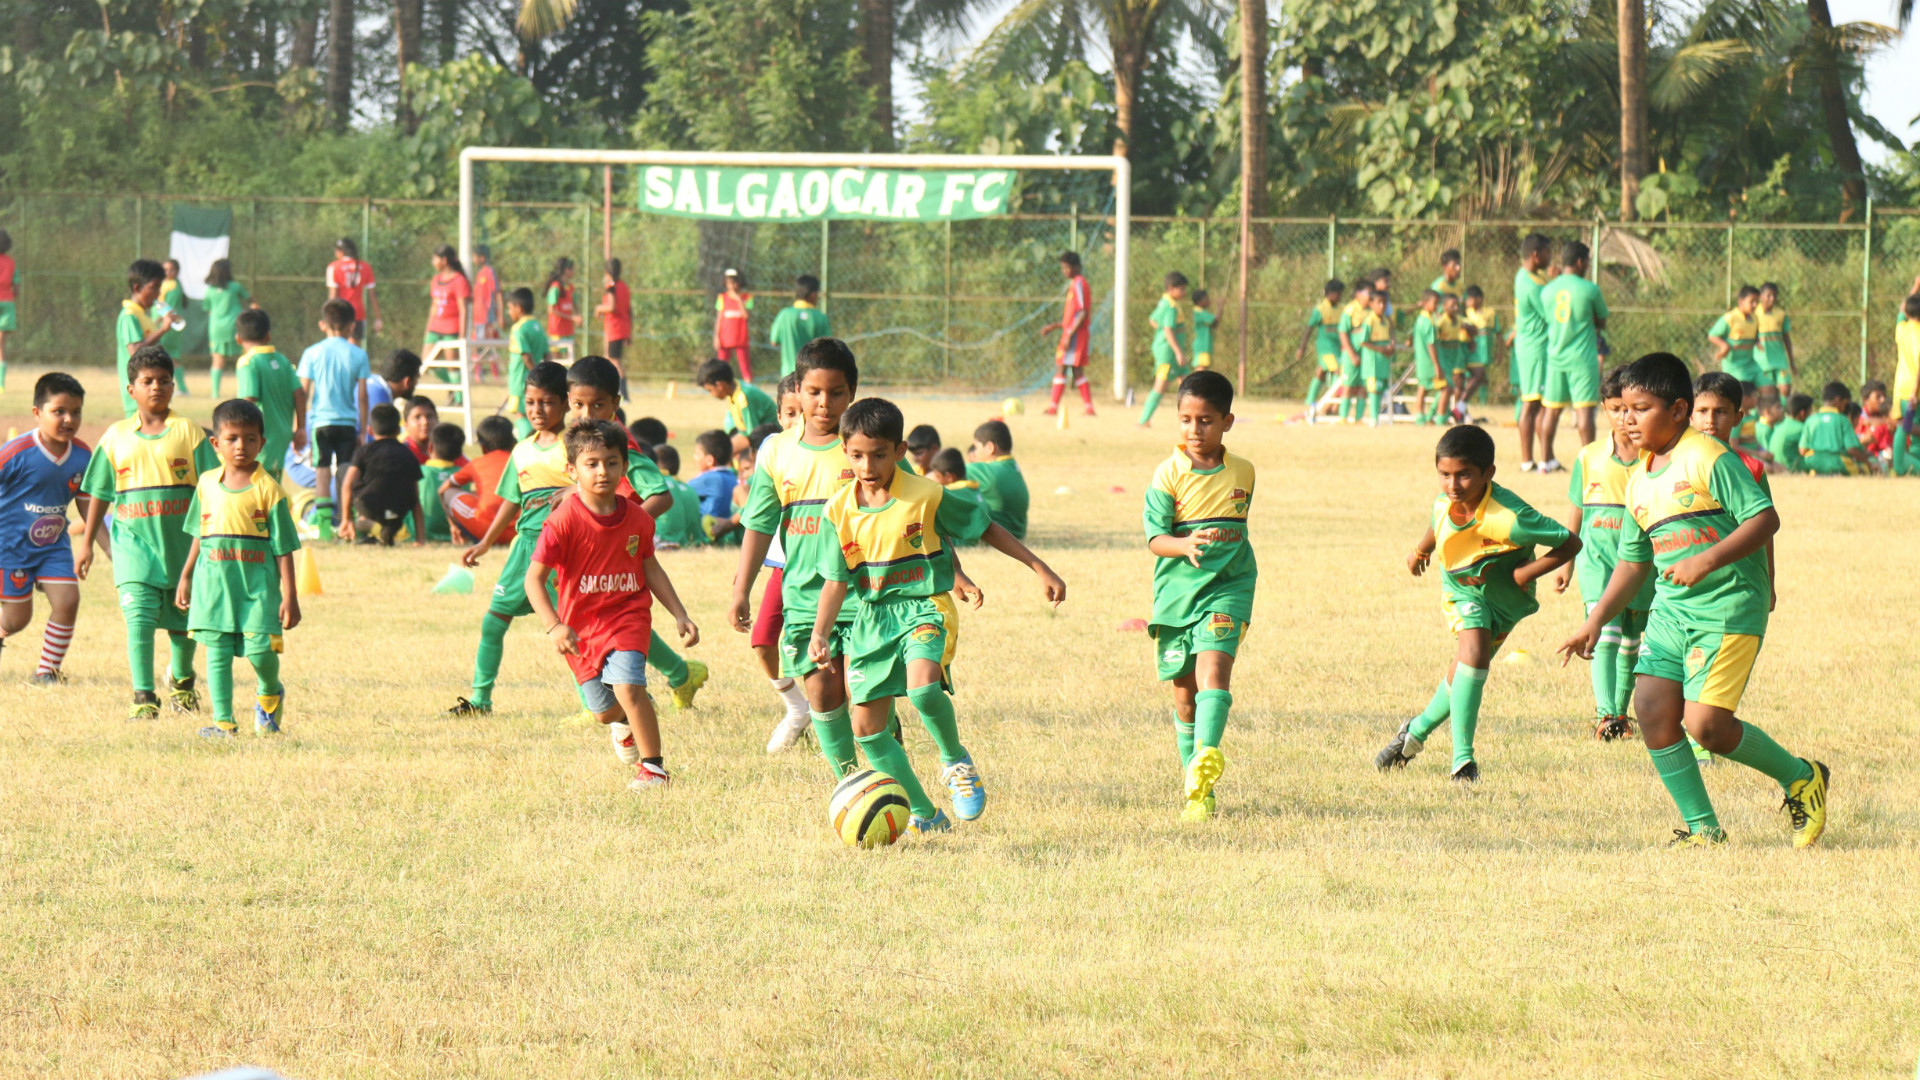 Salgaocar FC Community Outreach Programme 2016-17